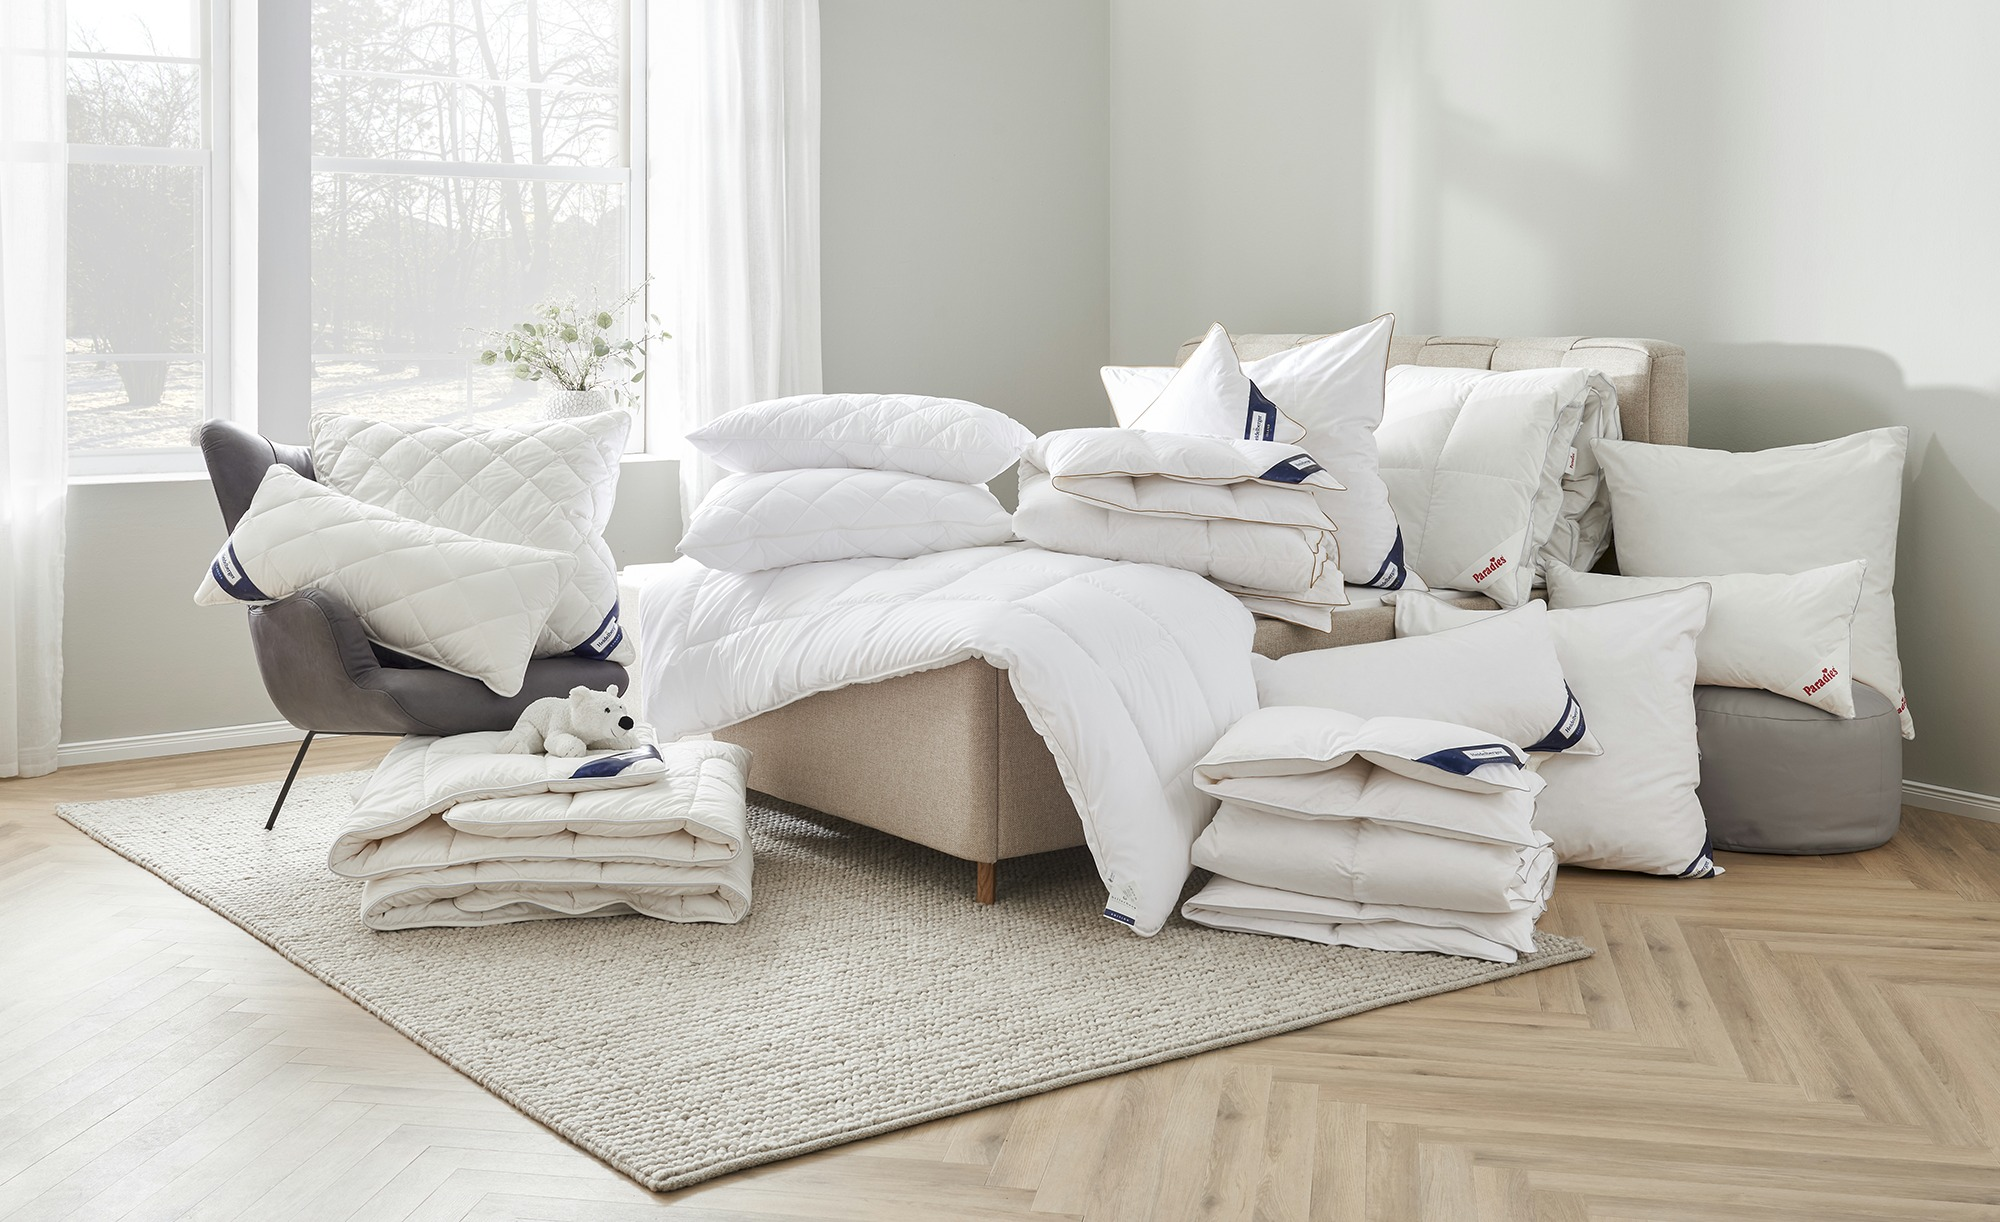 Billerbeck Kopfkissen  Granat ¦ weiß ¦ Maße (cm): B: 80 Bettwaren > Kopfkissen > Sonstige Kopfkissen - Höffner